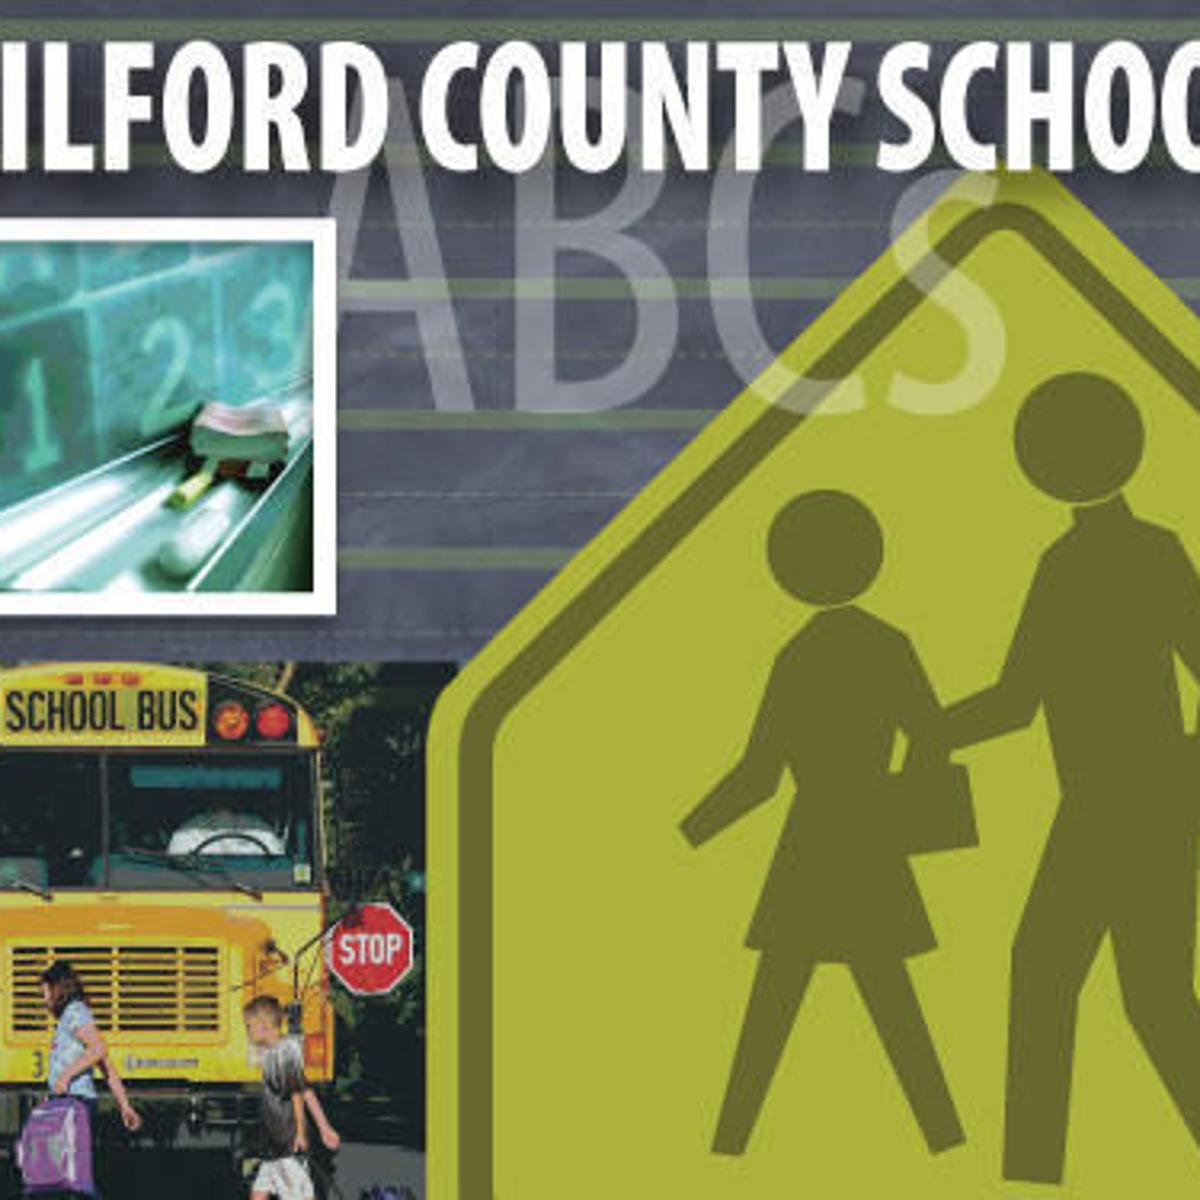 Educators Speak Out On Underfunding Of >> Guilford Educators Speak Out On Funding Issues Local News